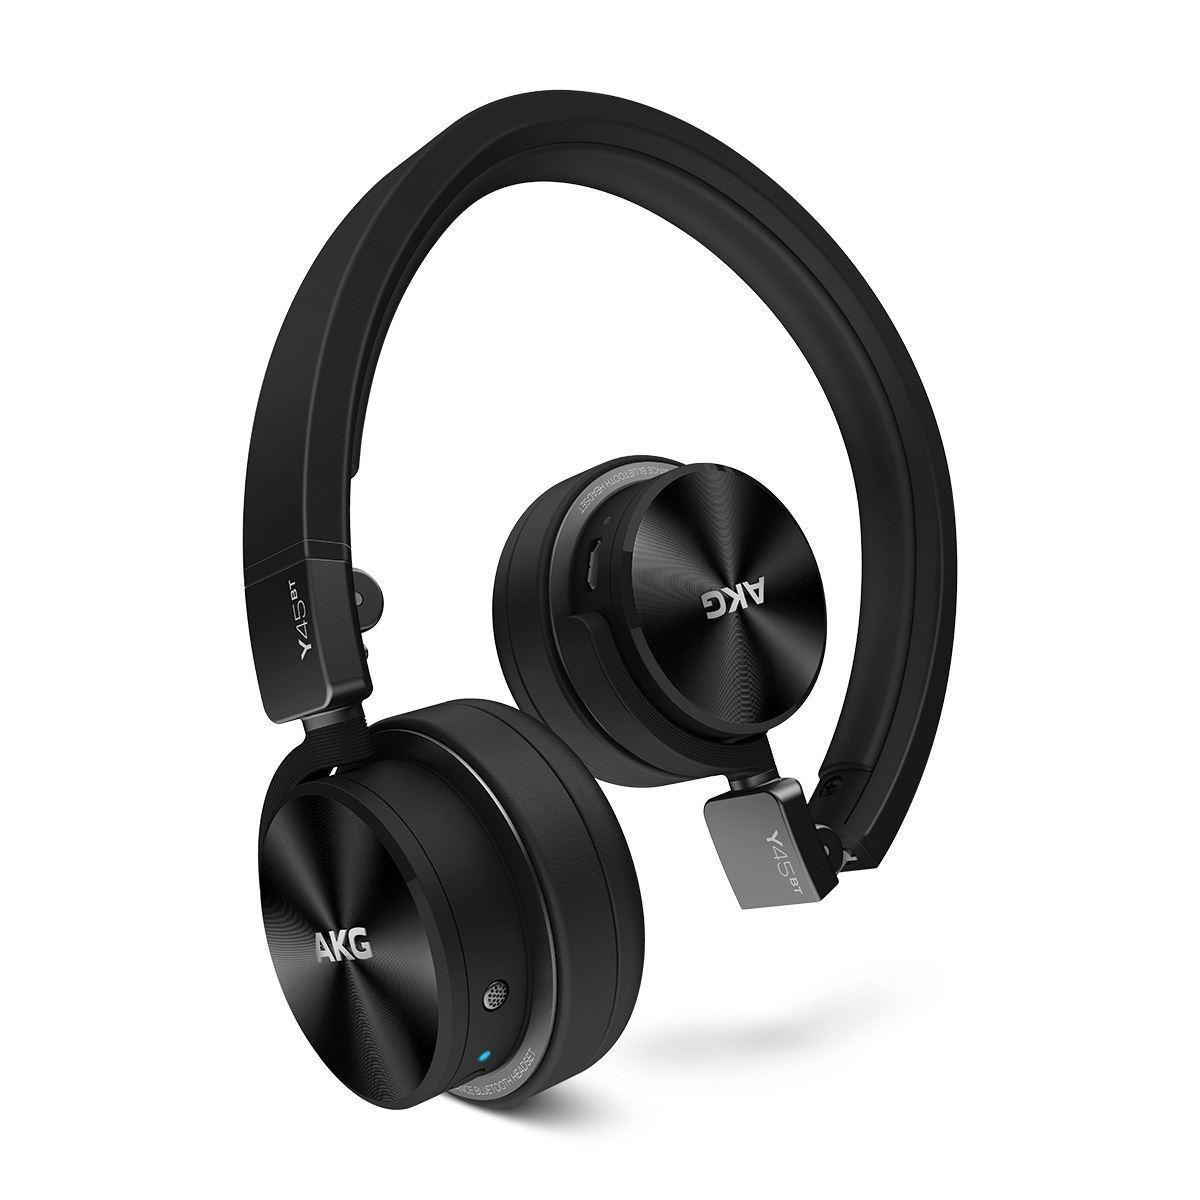 0002970_akg-y45-bluetooth-headphone.jpeg